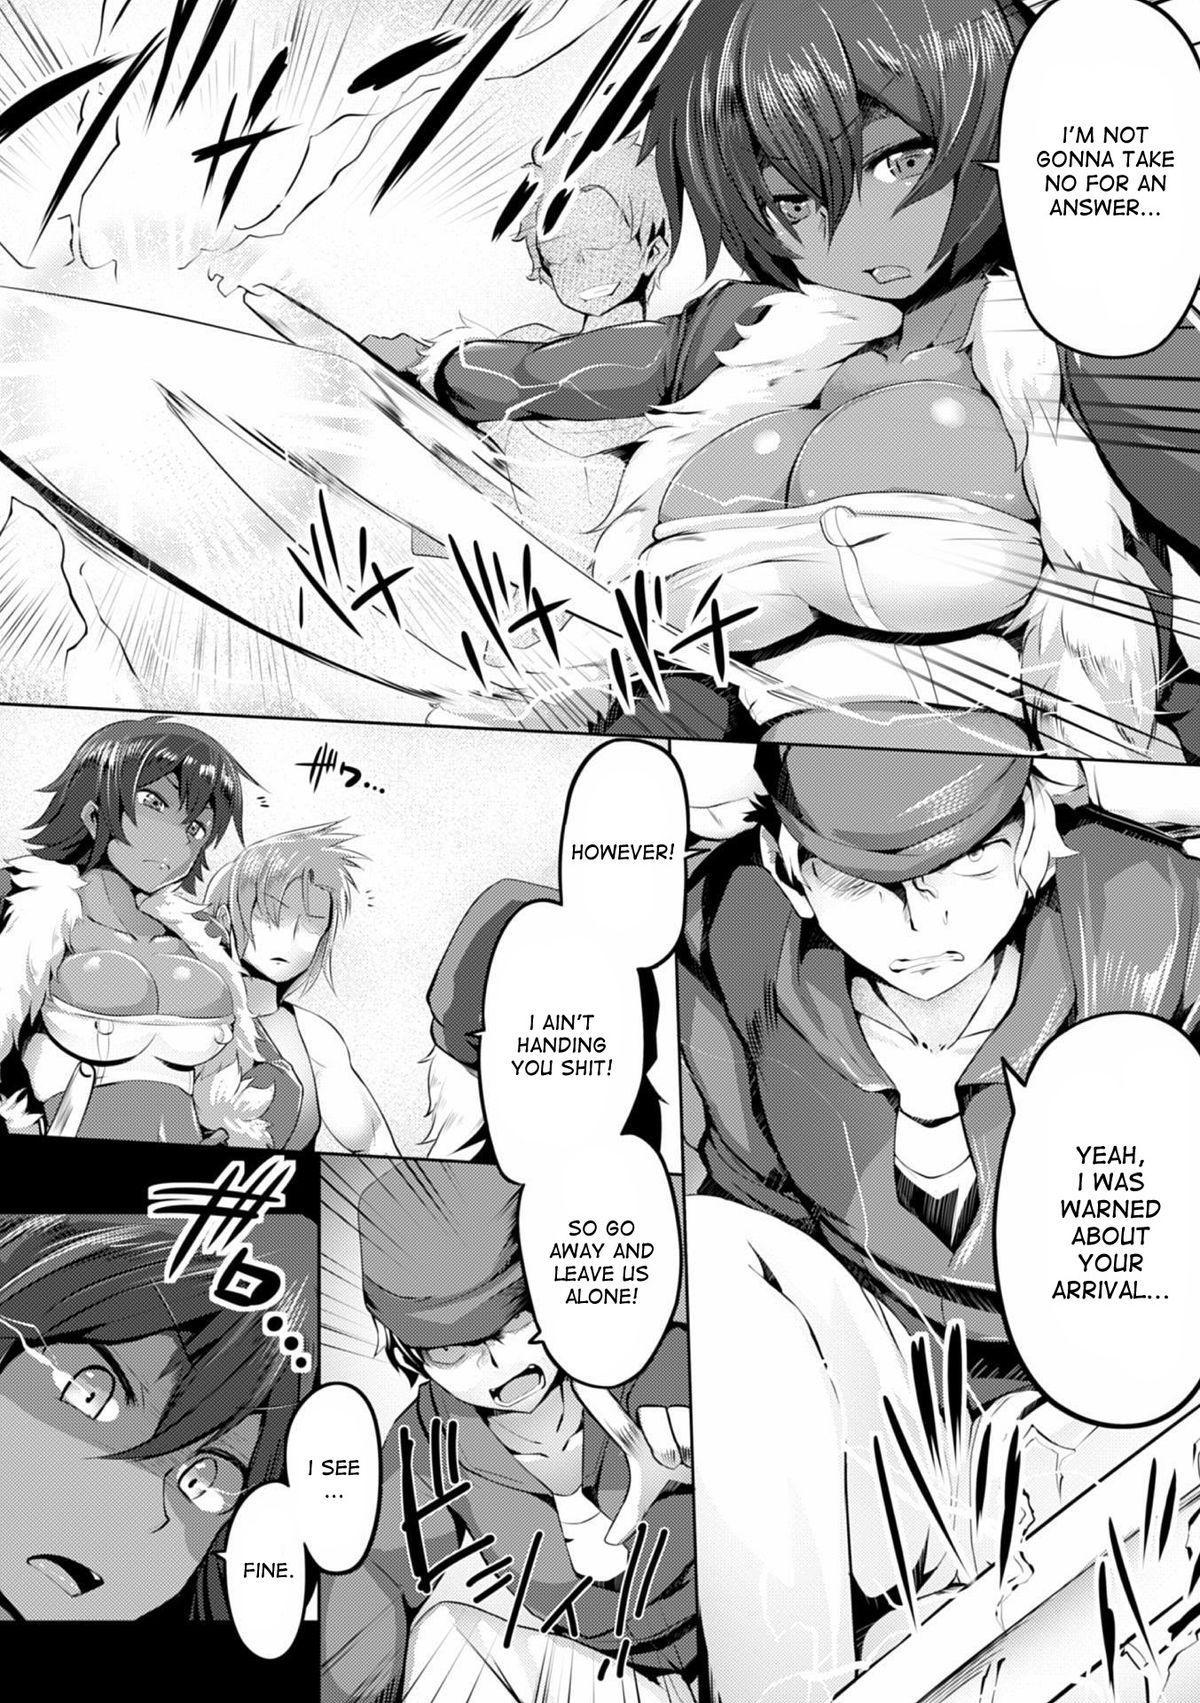 [Mizuyan] Anal Breaker!! ~Zecchou! Nikubenki~ | Anal Breaker!! ~Climax! Cum Dumpster~ (Heroine Pinch Vol. 11) [English] [desudesu] [Digital] 1